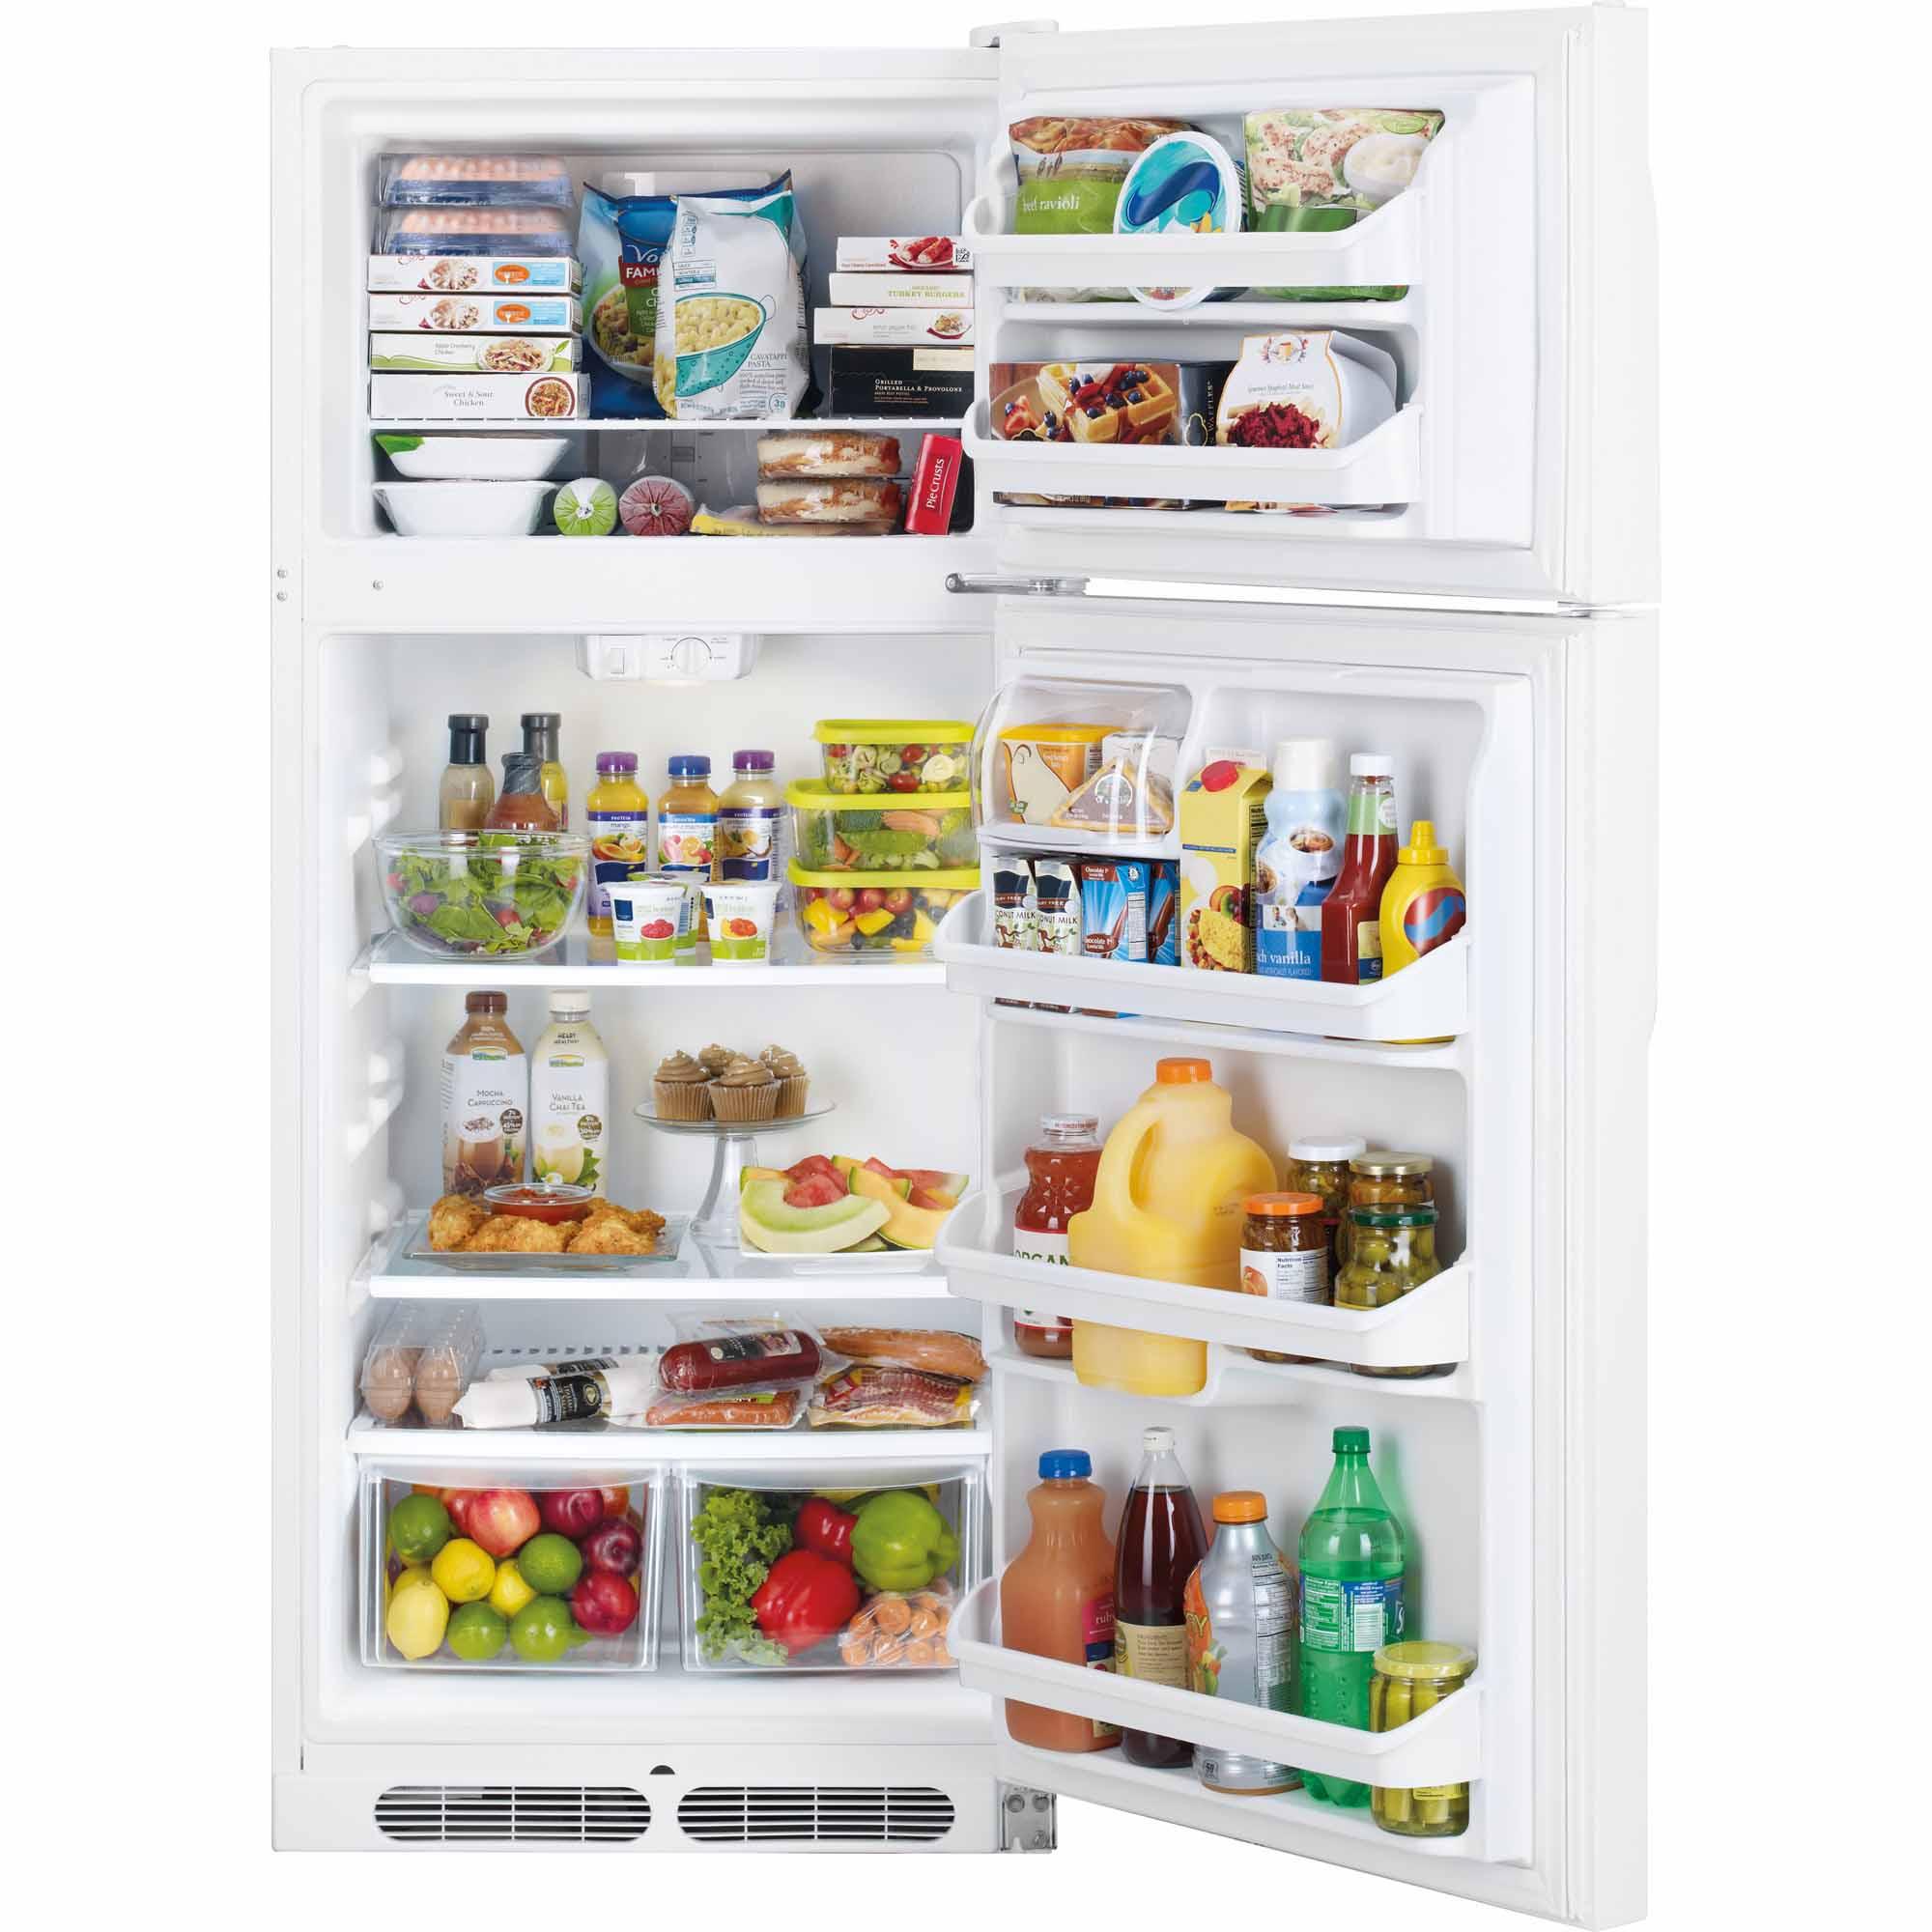 Kenmore 60402 16.3 cu. ft. Top Freezer Refrigerator - White